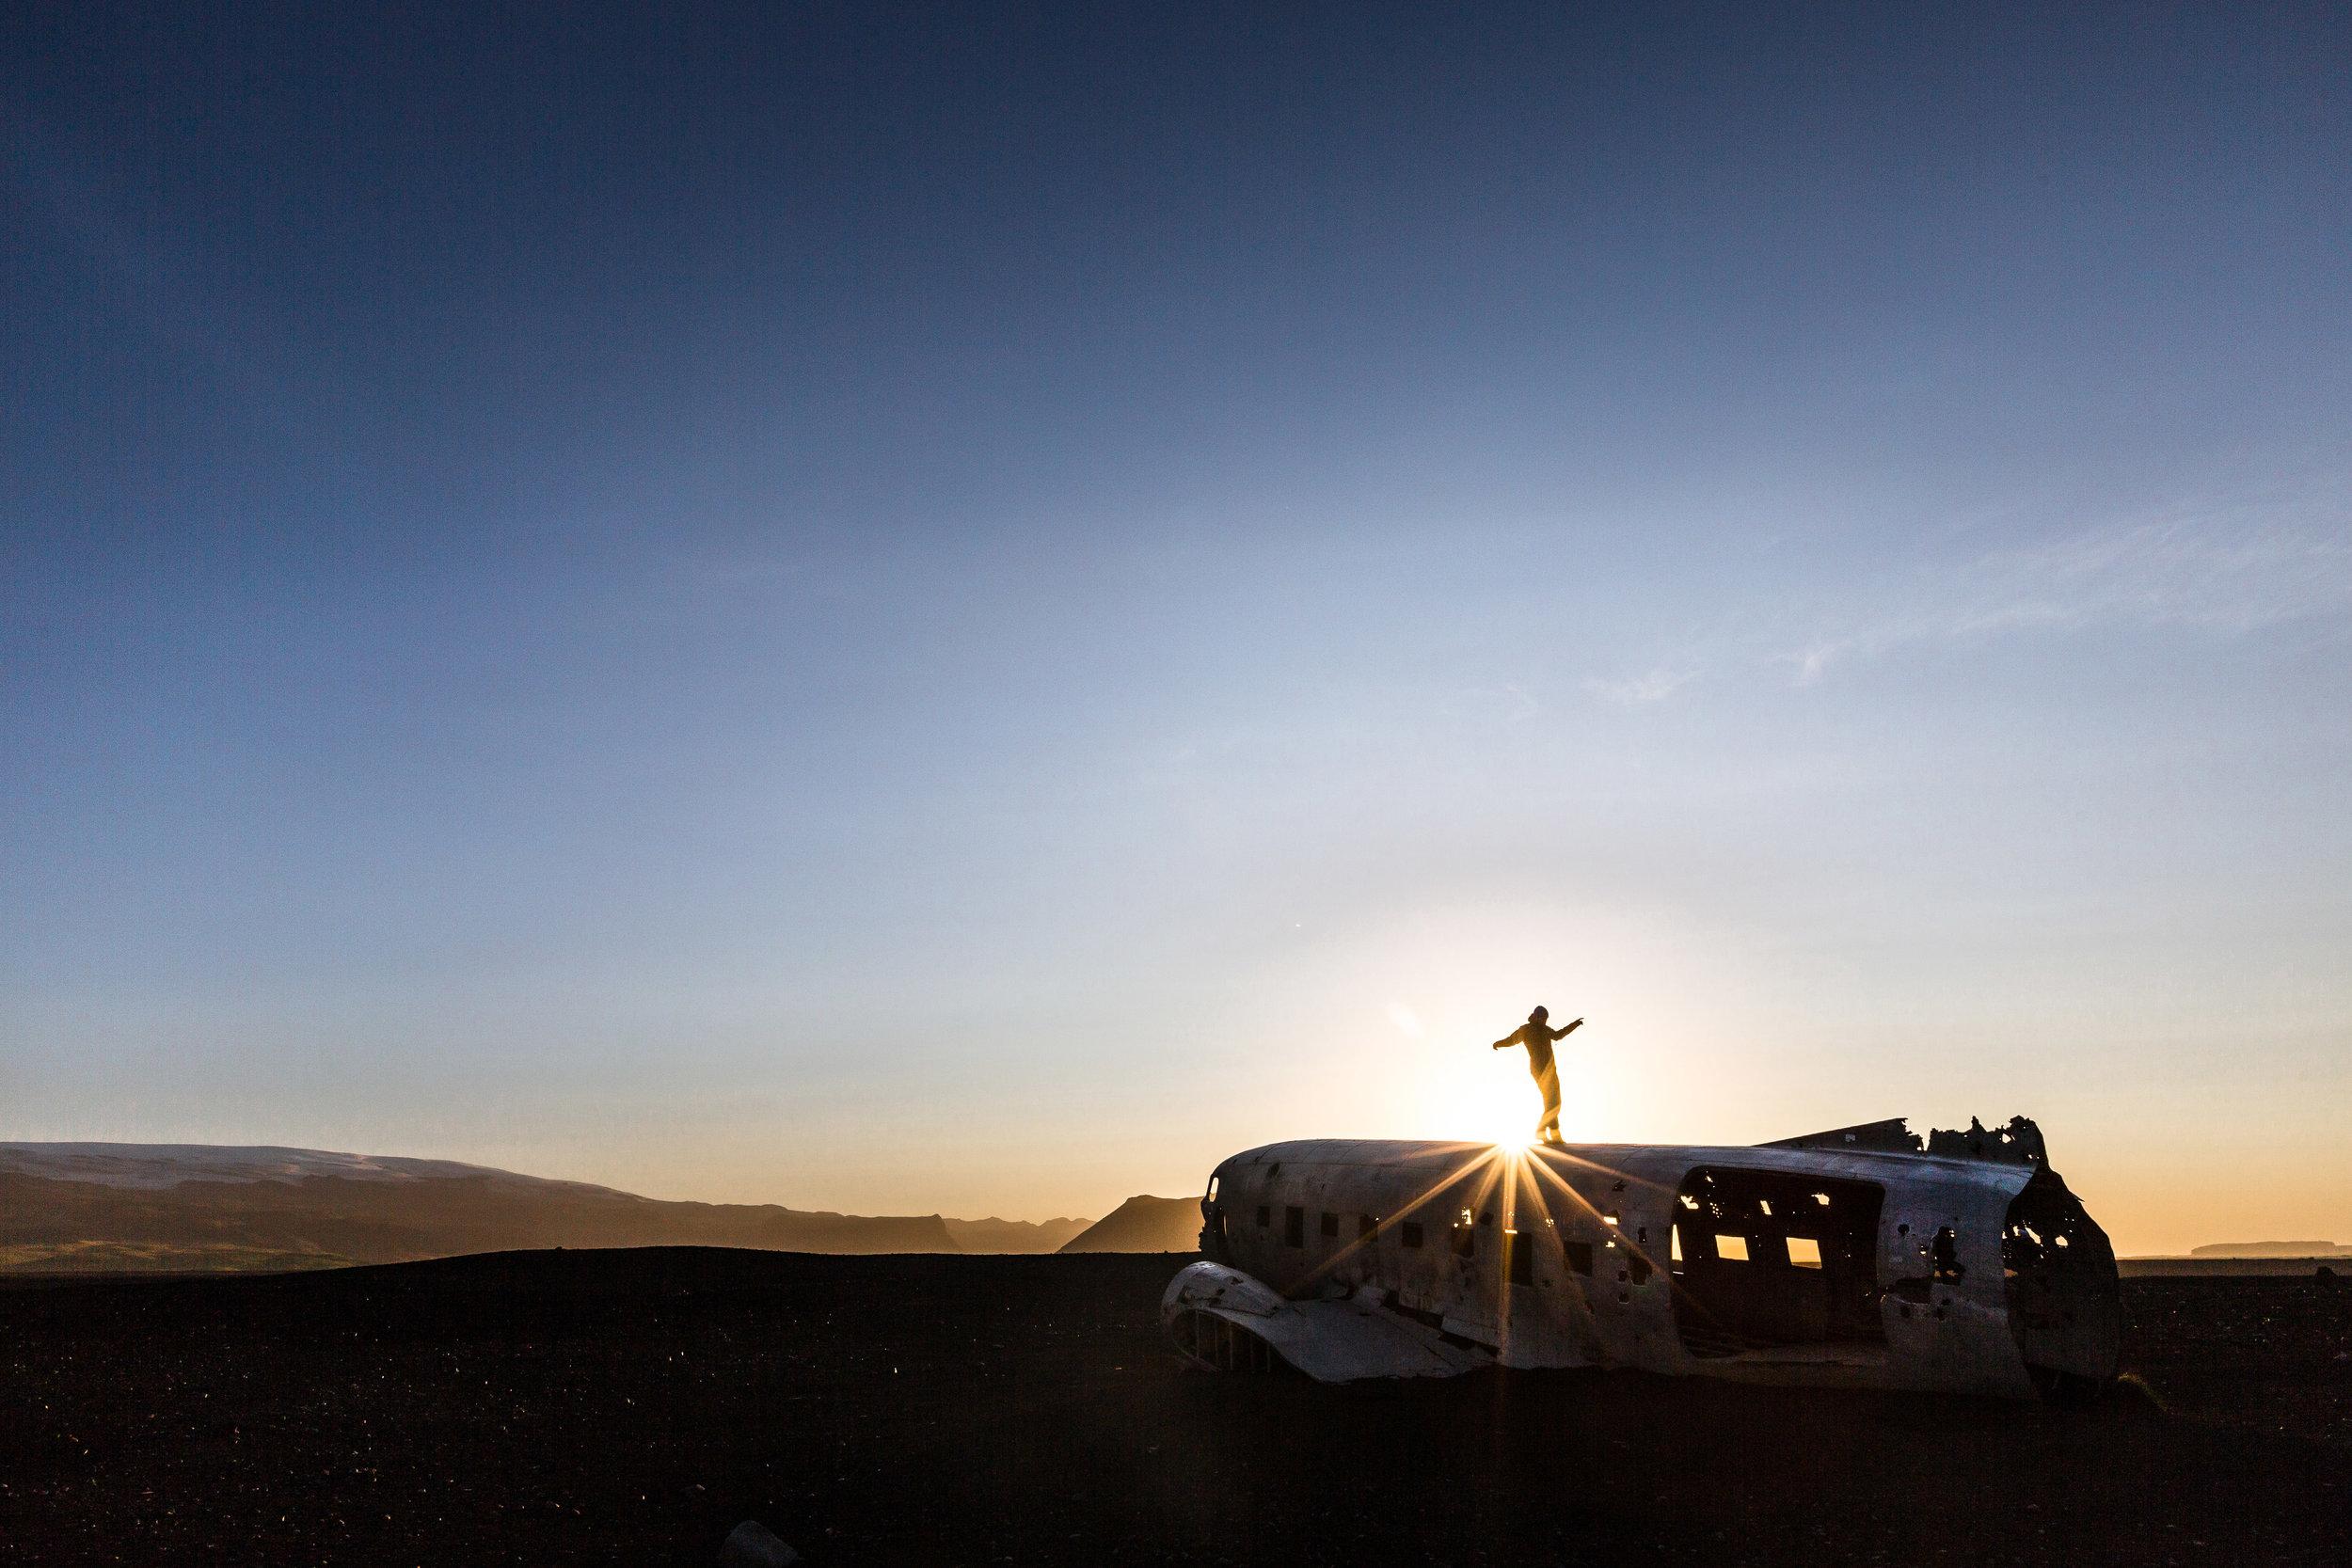 Plane Wreck sunrise